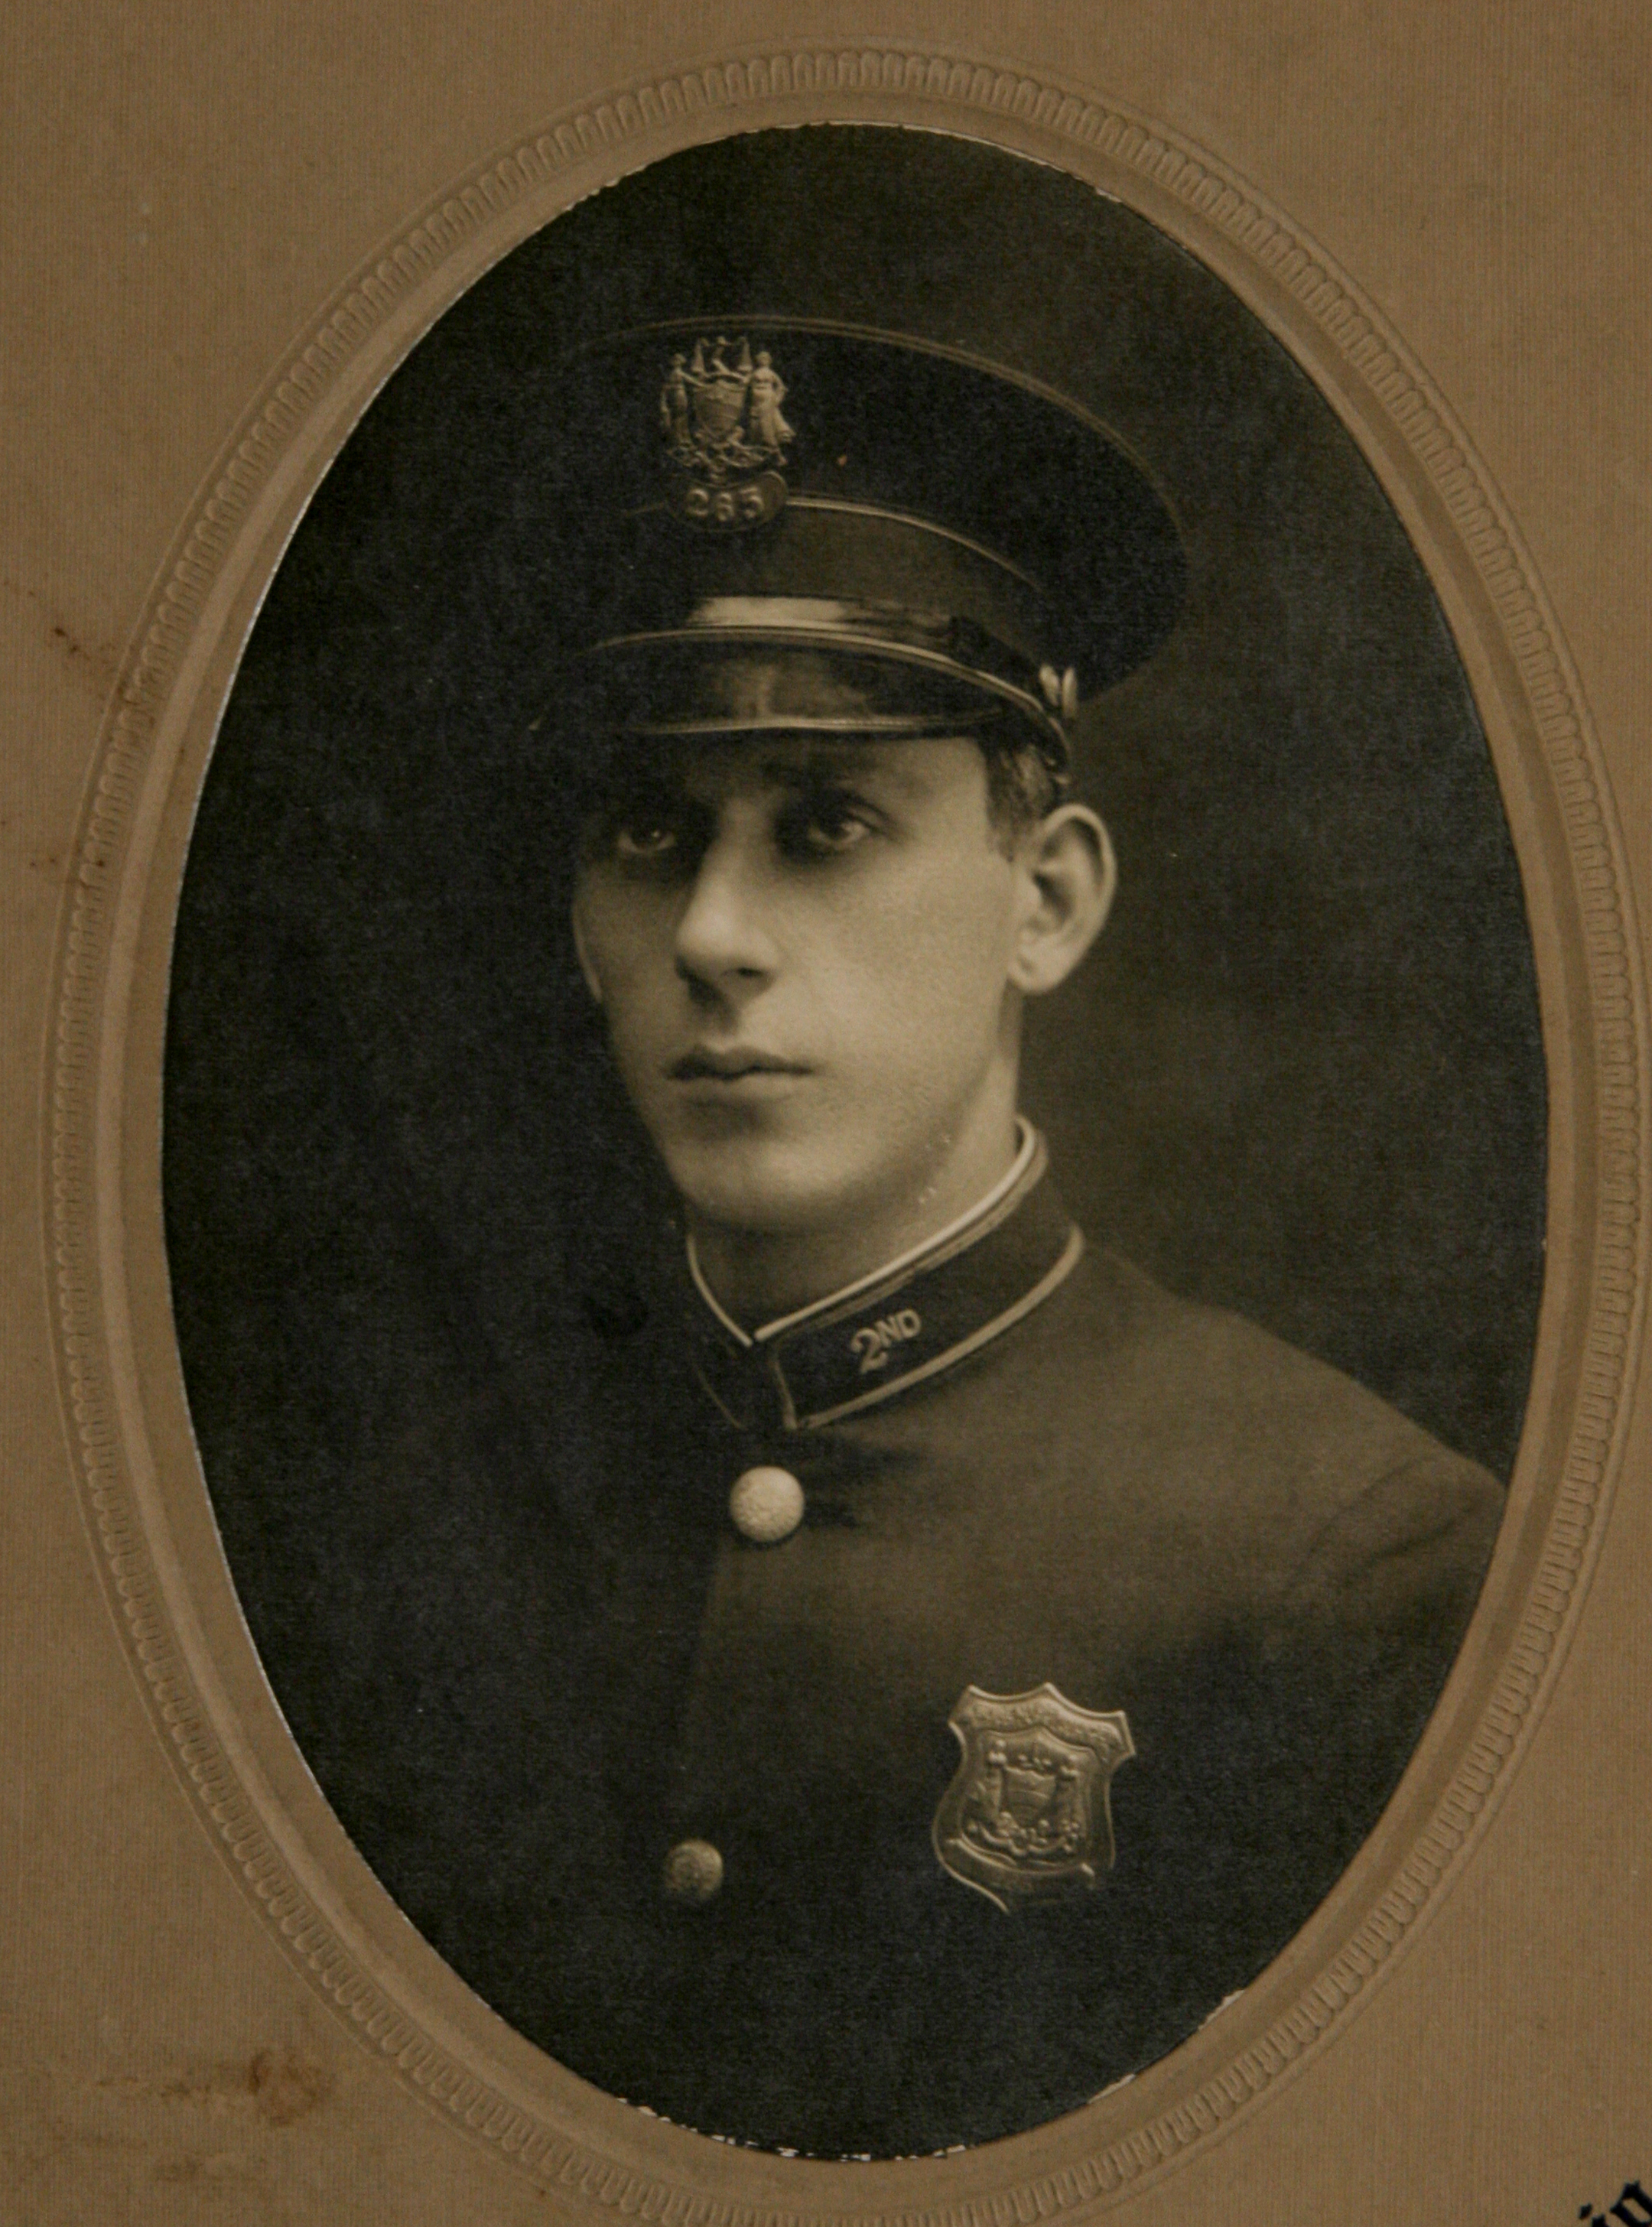 Police Officer Joseph T. Swierczynski   Philadelphia Police Department, Pennsylvania